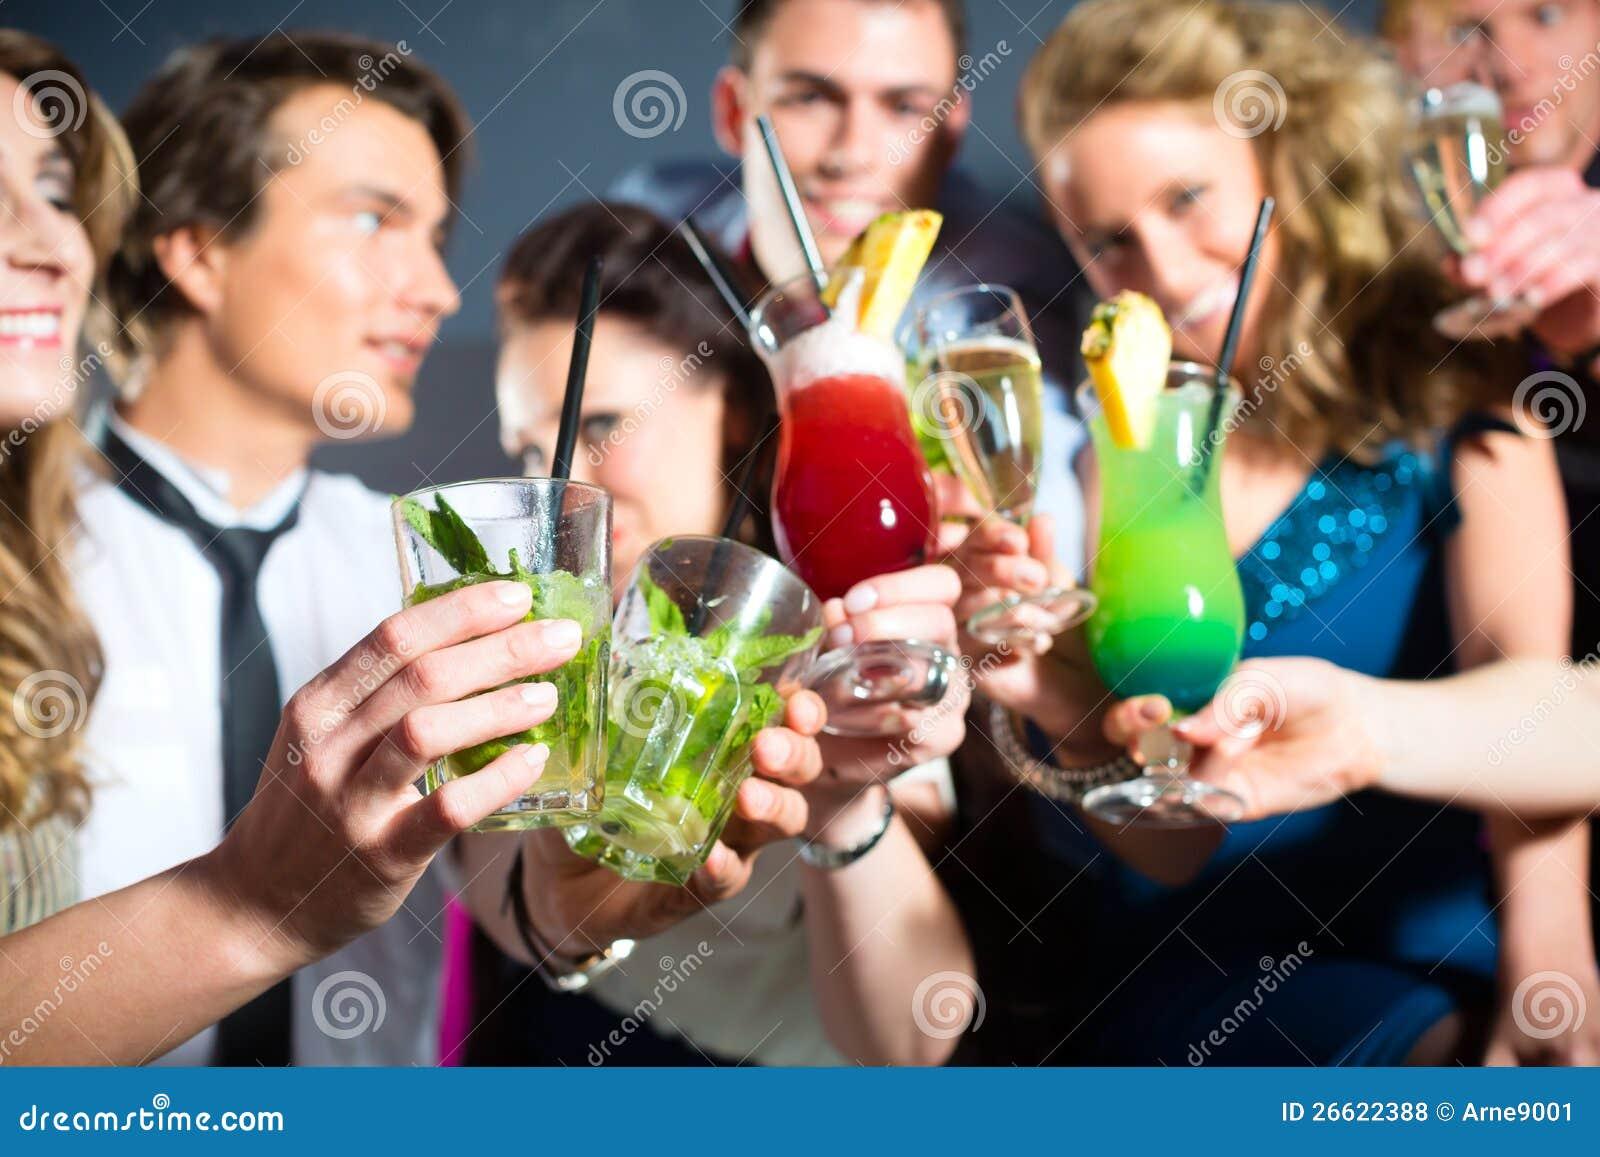 Drinker Society - Drinker Club